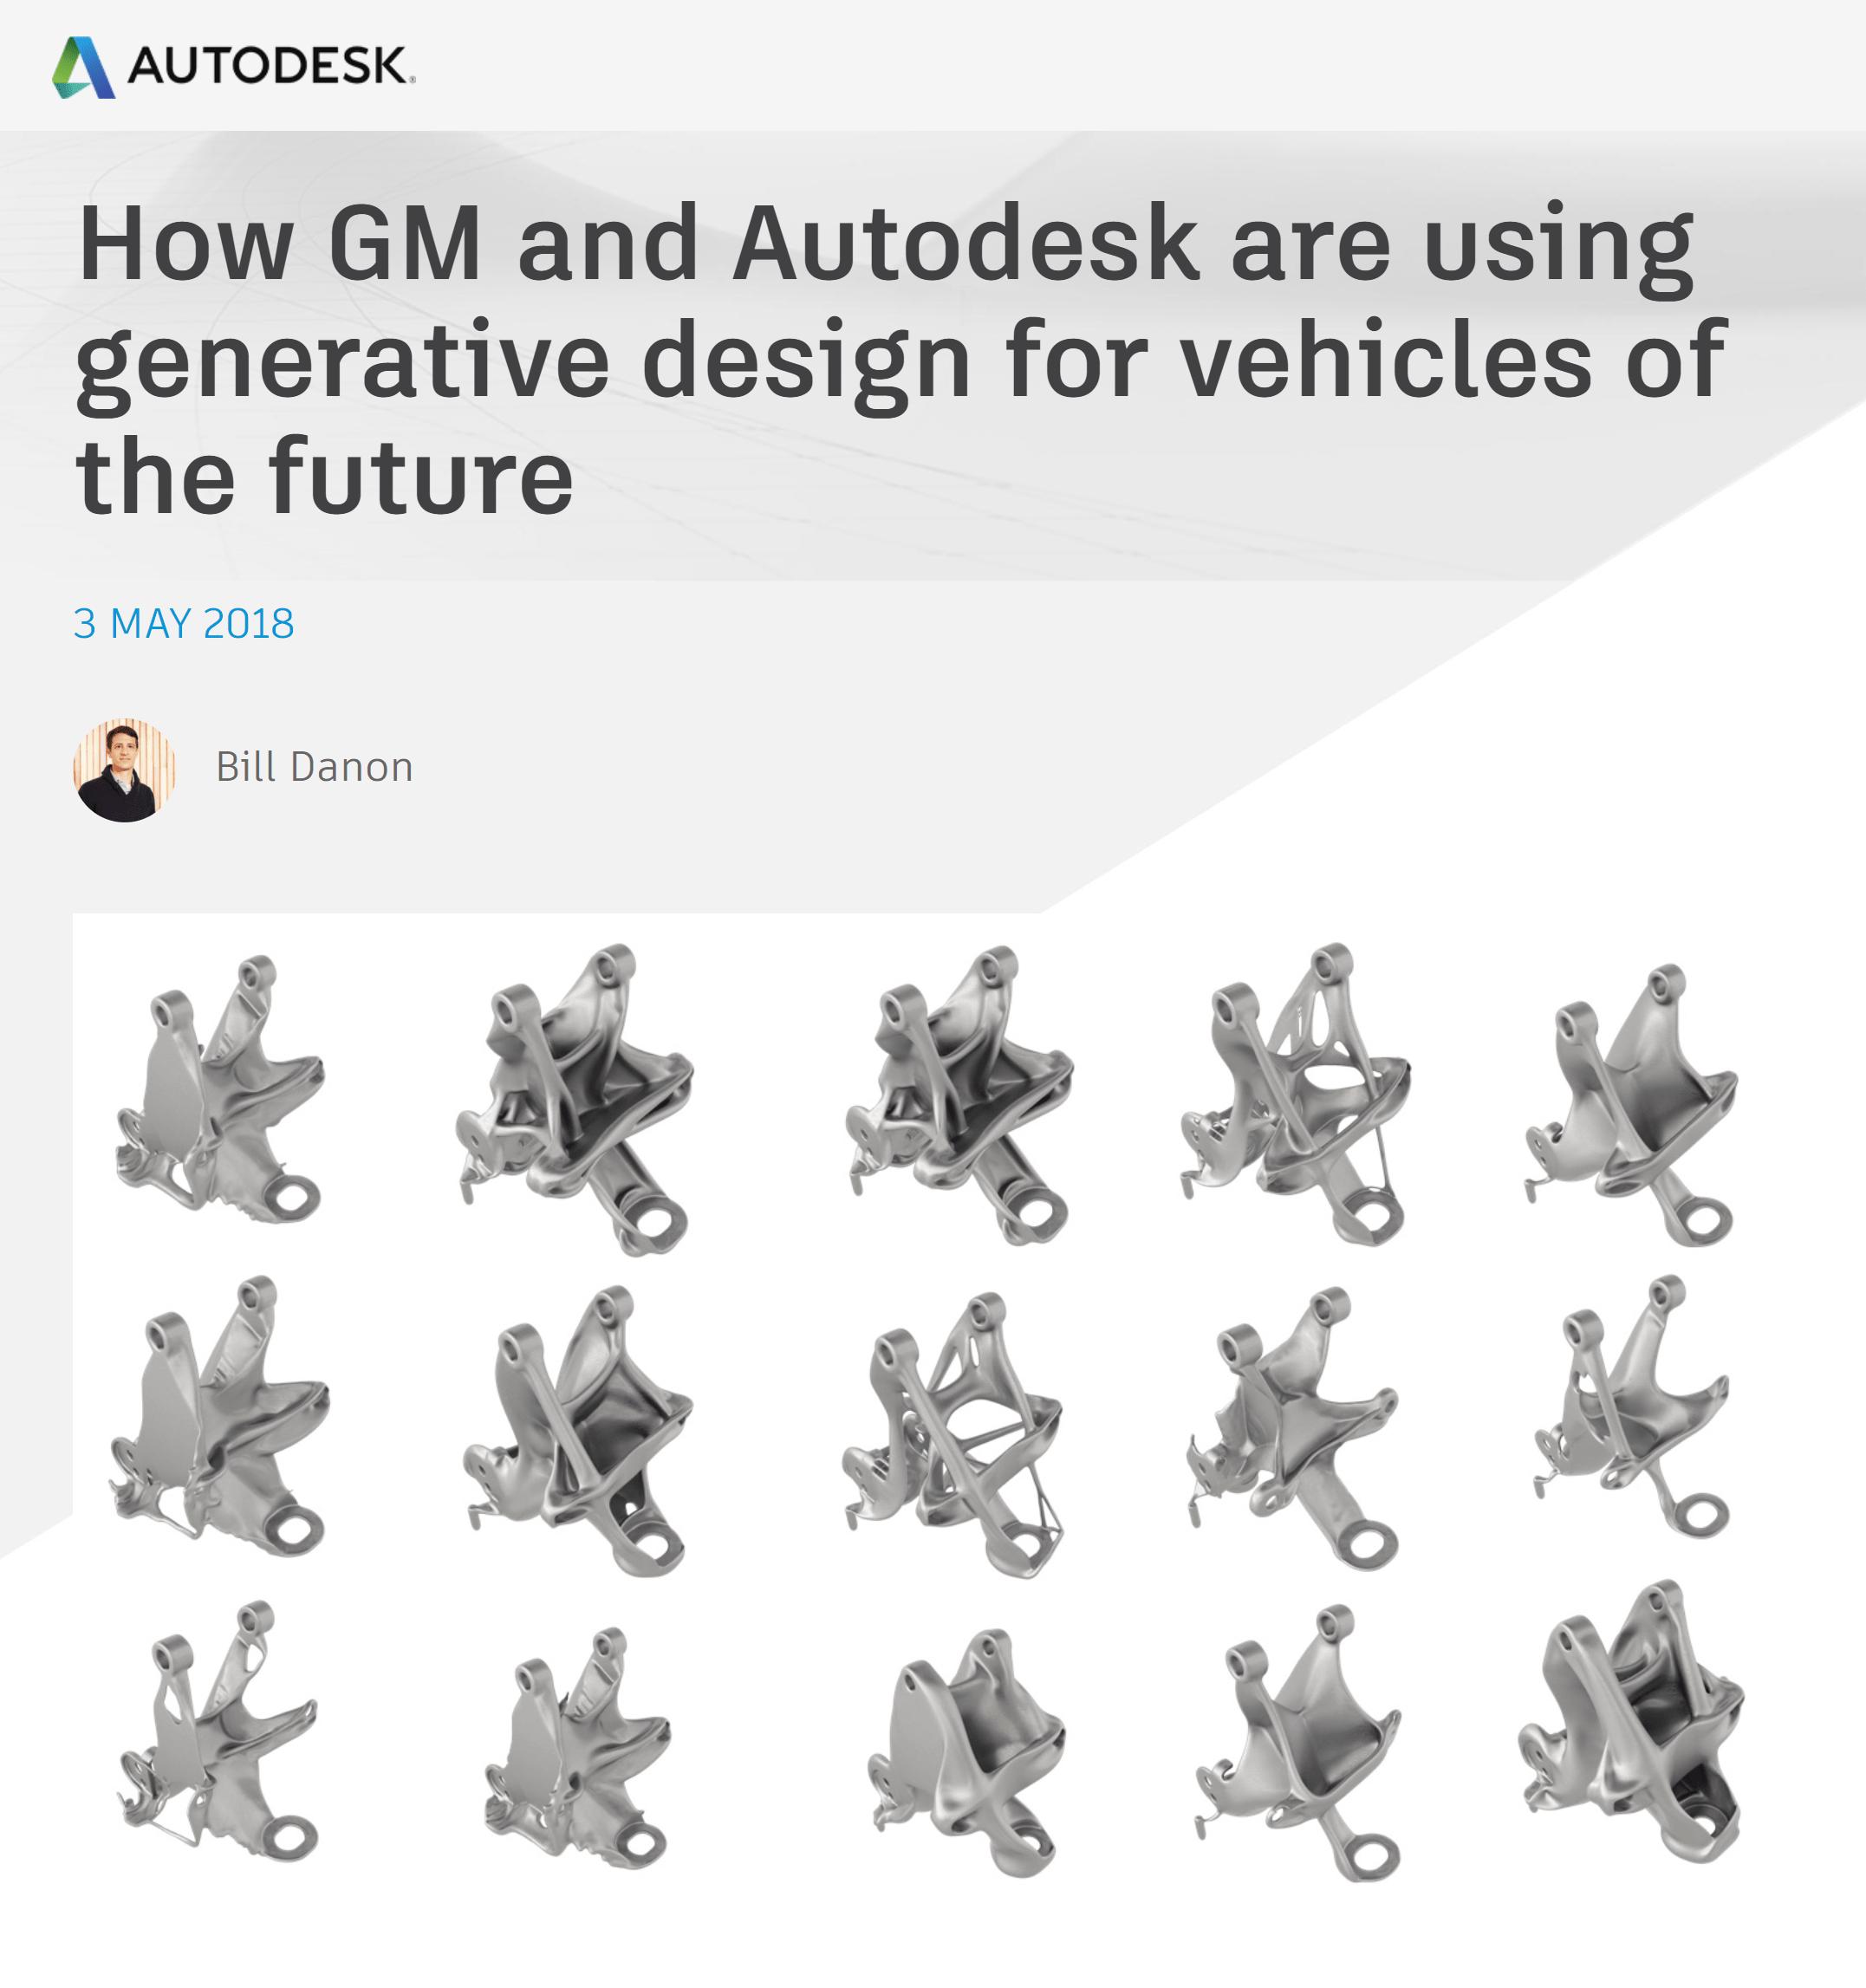 gm-autodesk-using-generative-design-v...